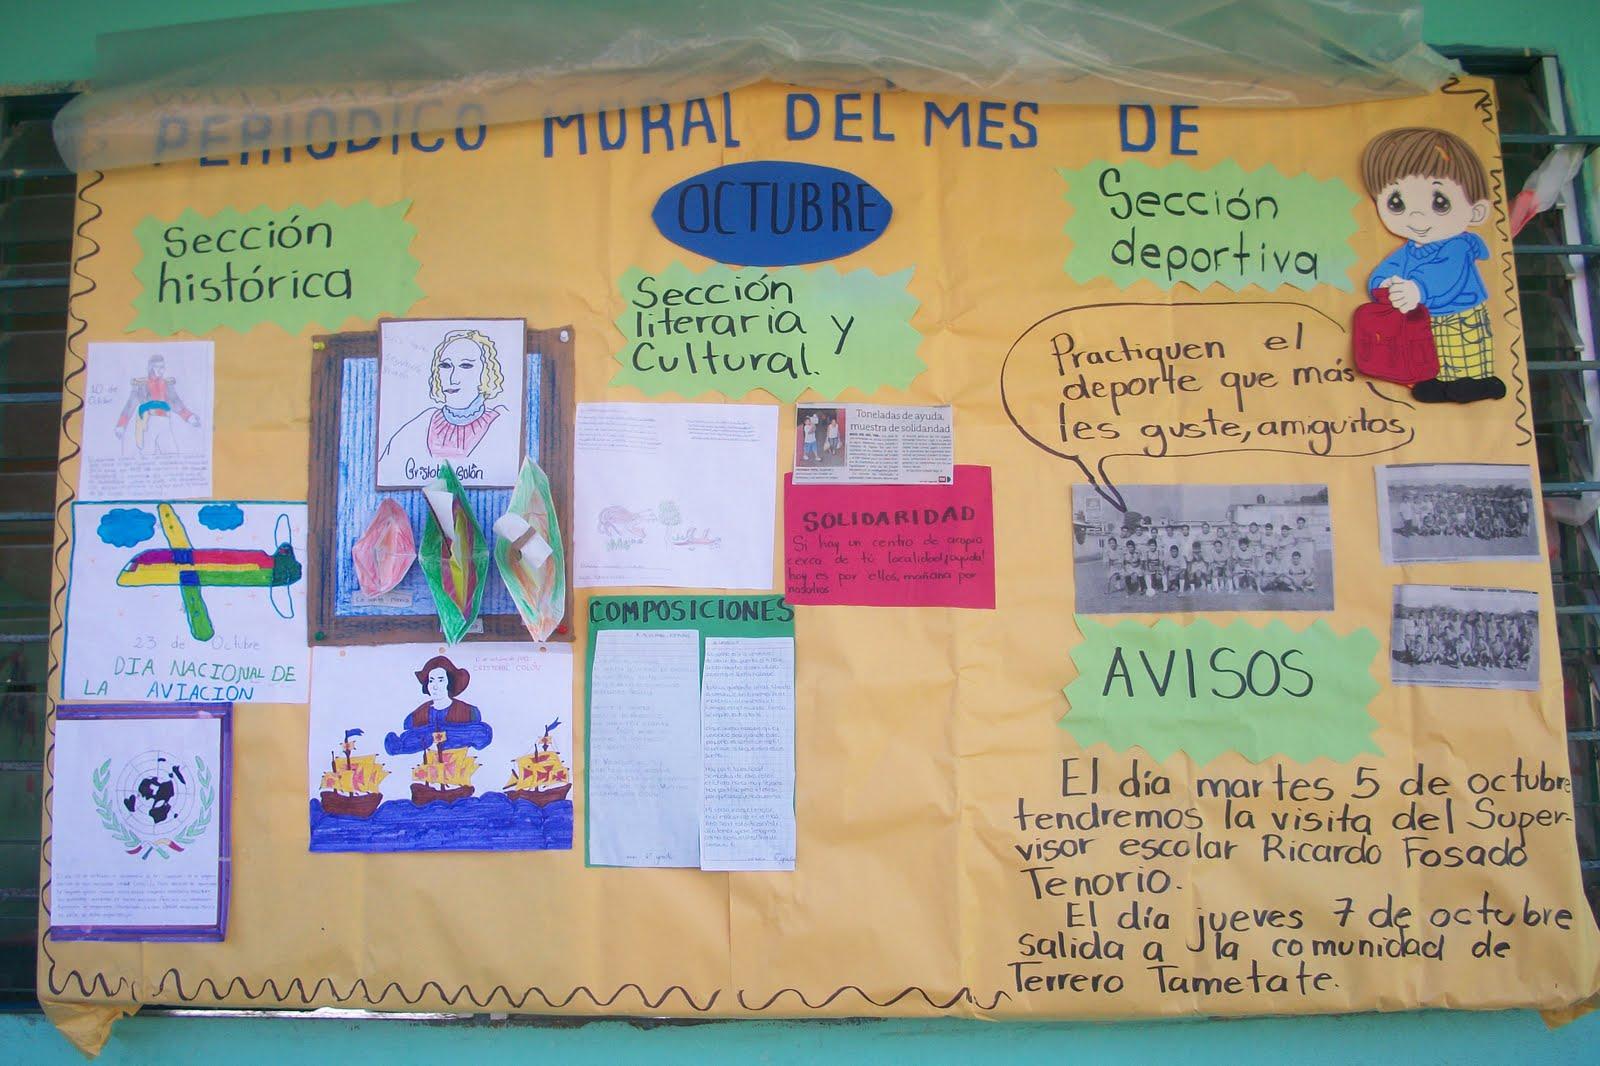 Supervisi n escolar zona 002 tantoyuca norte el peri dico for Caracteristicas de un mural